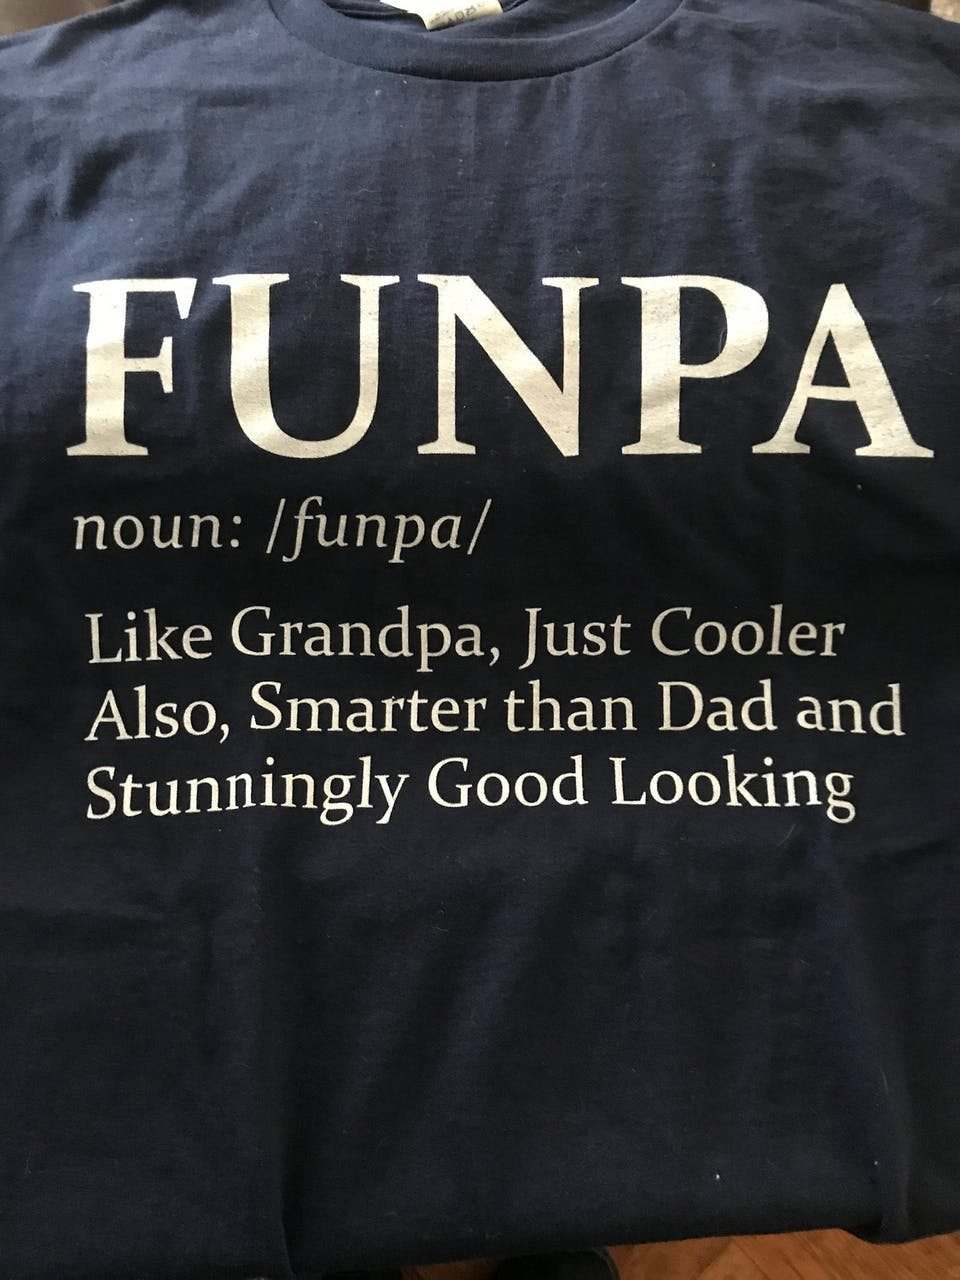 Funny Gifts for Grandpa Funpa Noun Like A Grandpa, Just Cooler Definition T-Shirt